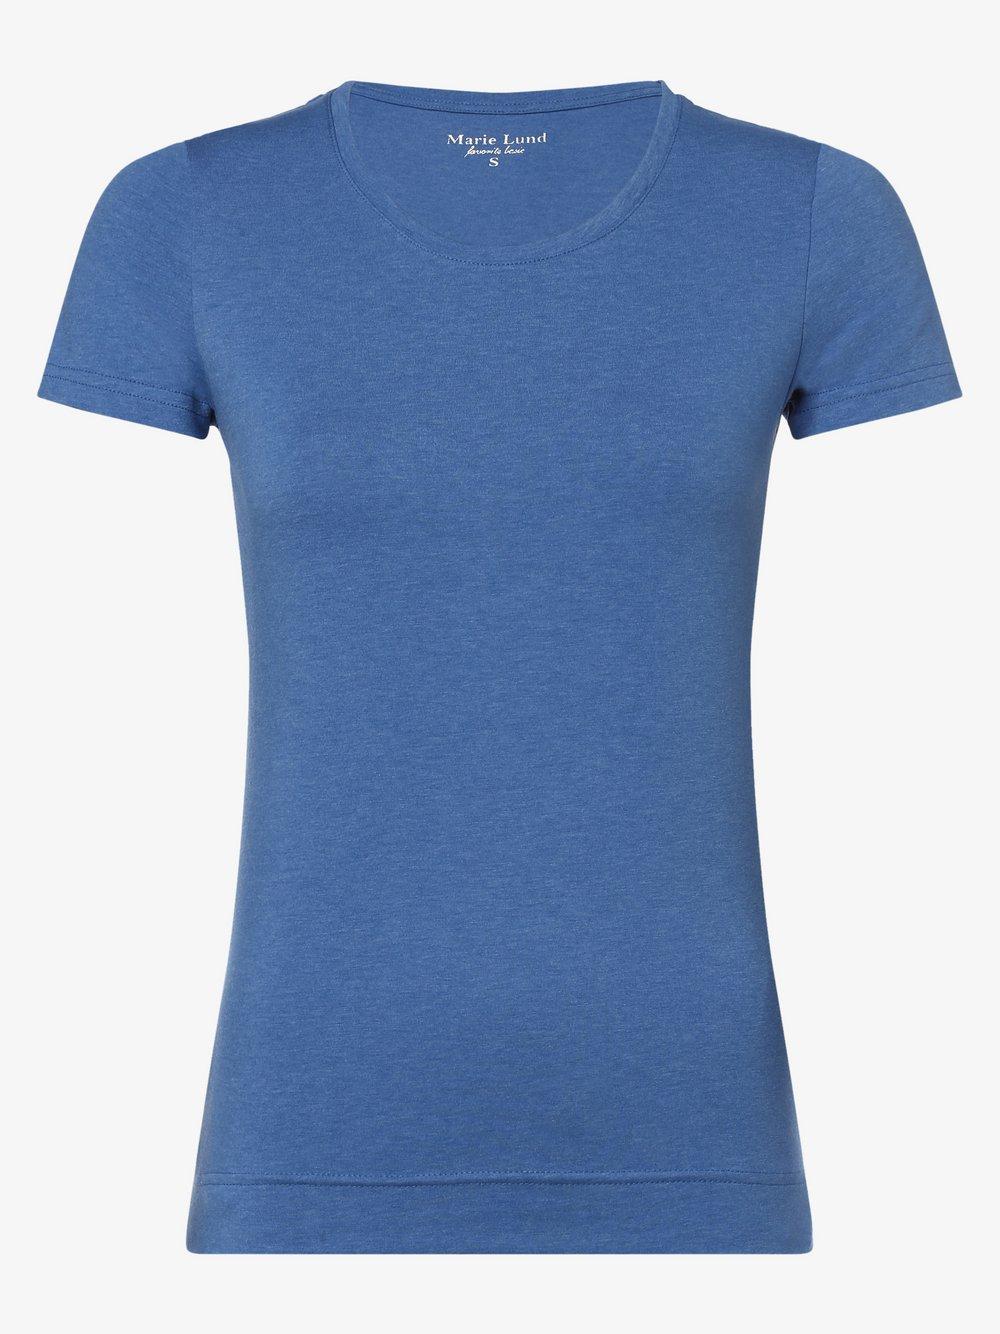 Marie Lund - T-shirt damski, niebieski